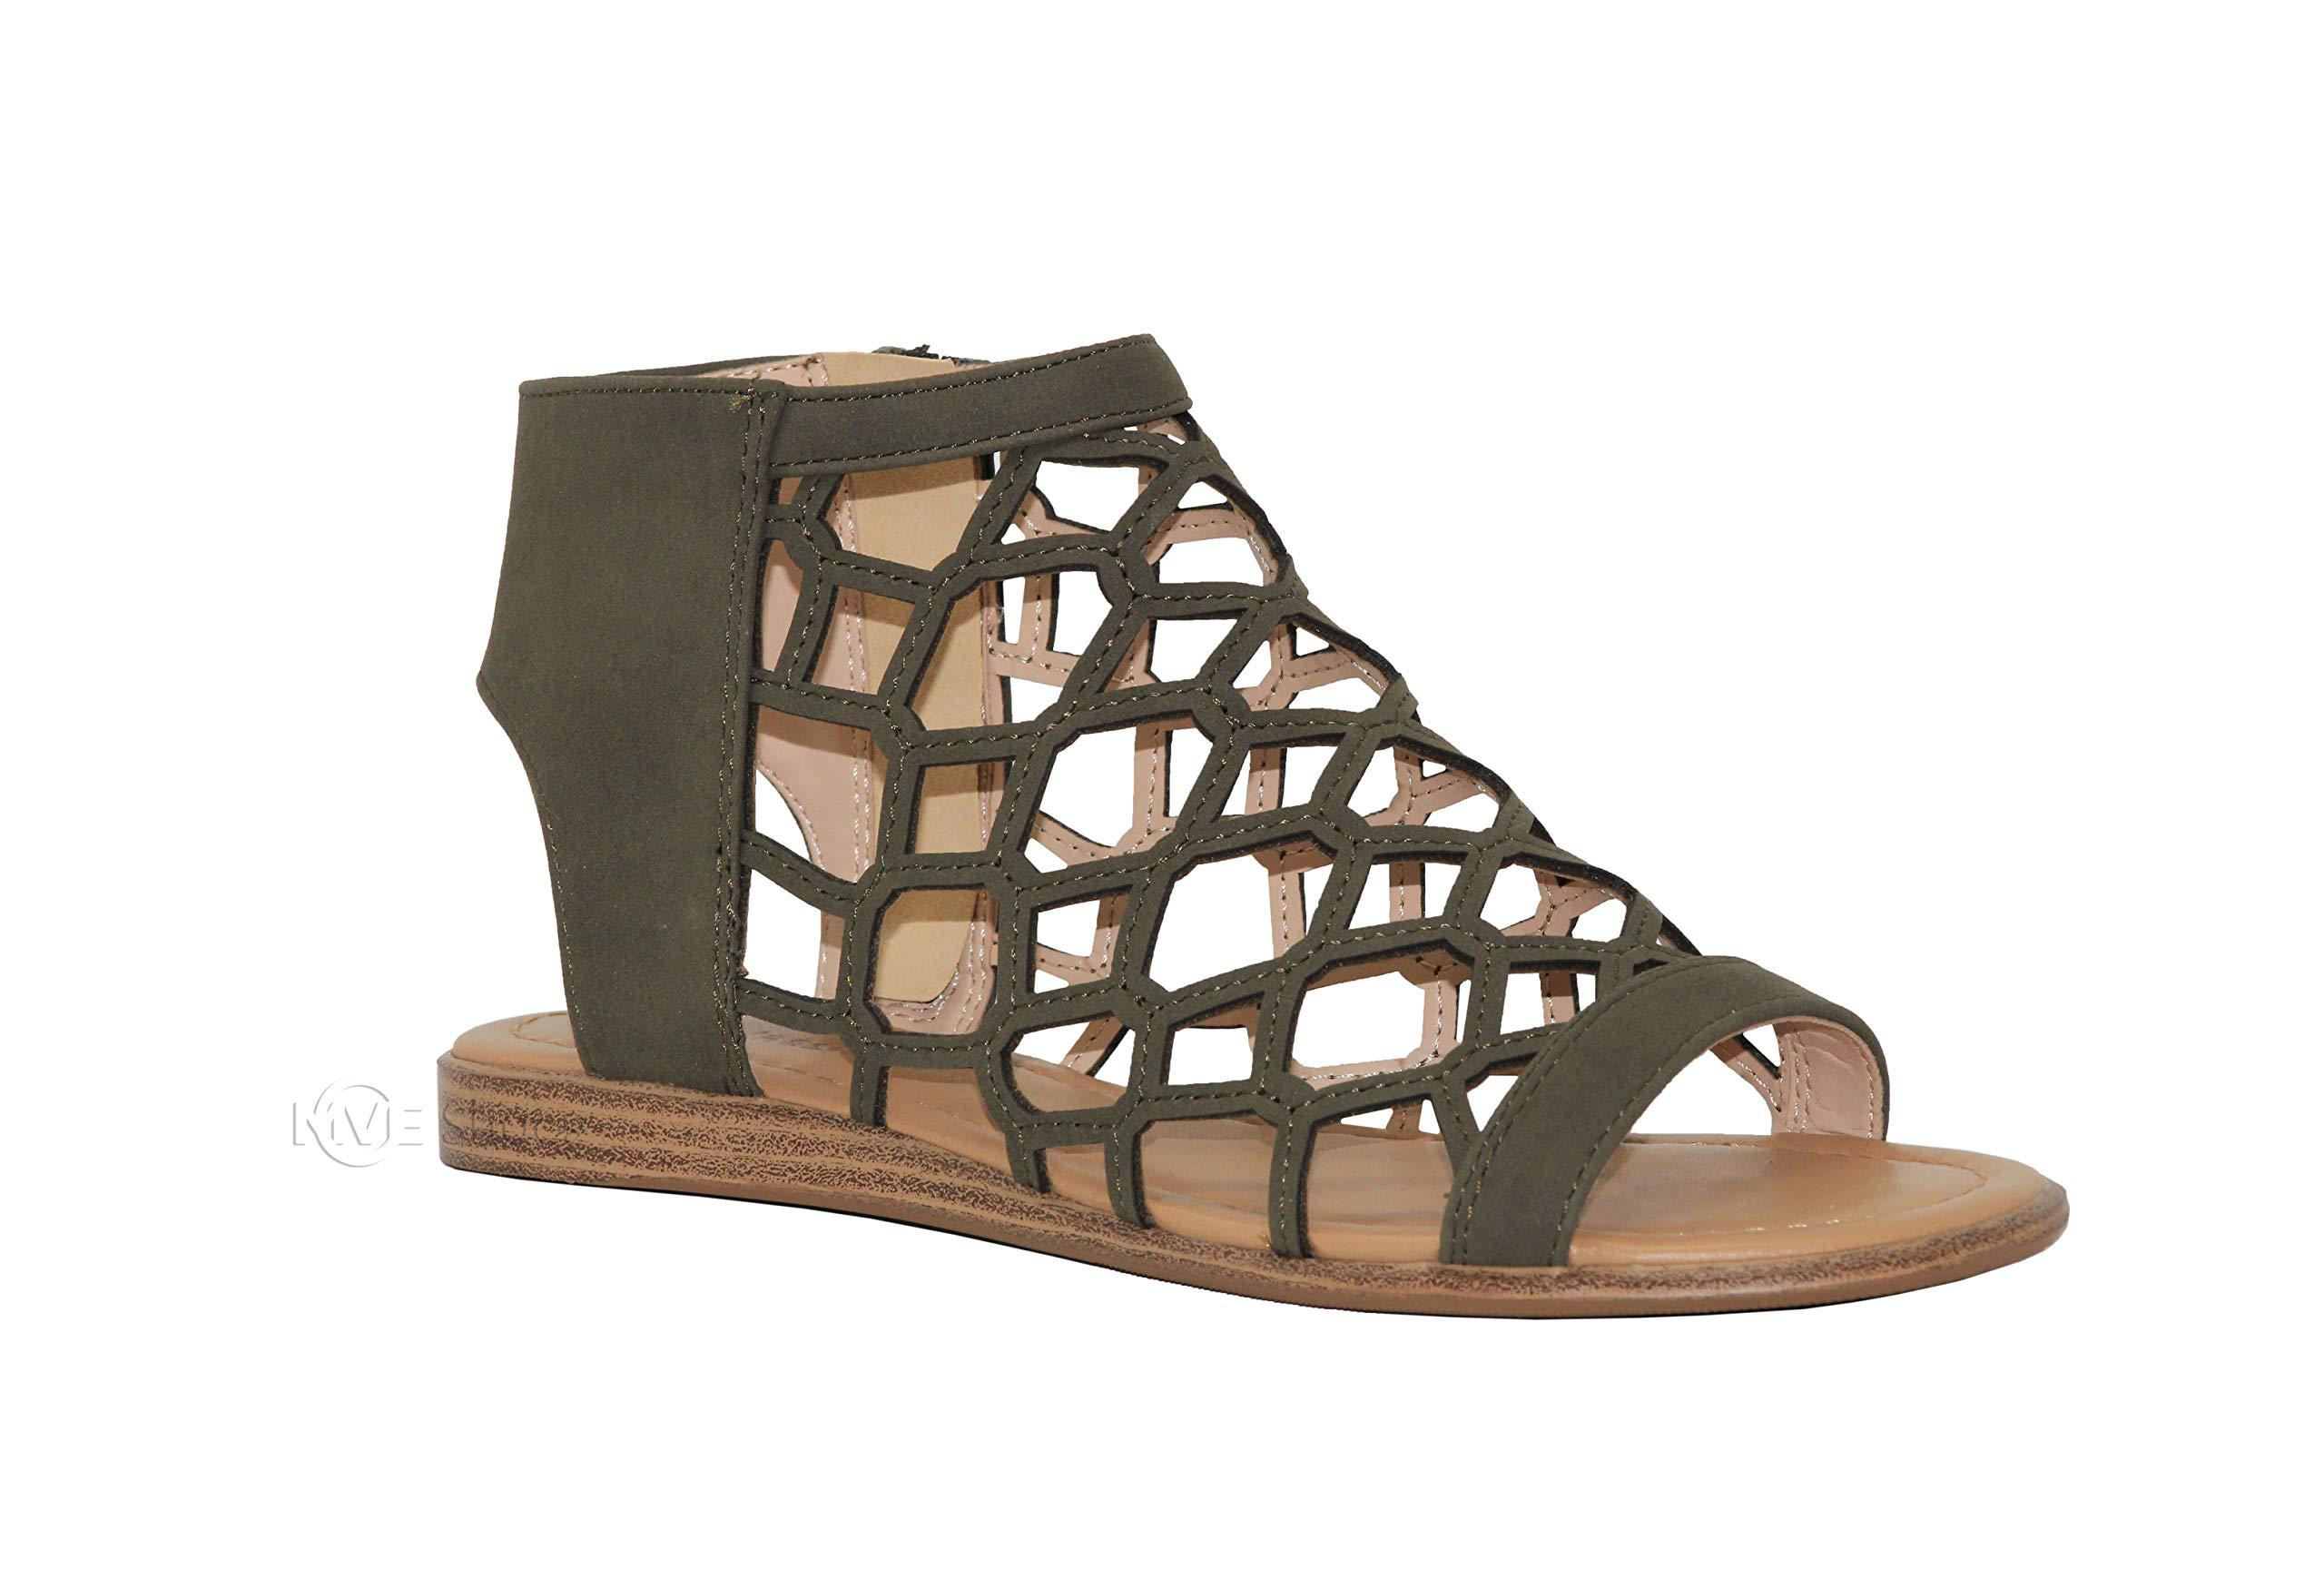 MVE Shoes Women's Fashion Open Toe Sandals - Gladiator Cut Out Bohemian Flat Sandals-Ankle Strappy Shoes, Khaki pu Size 8